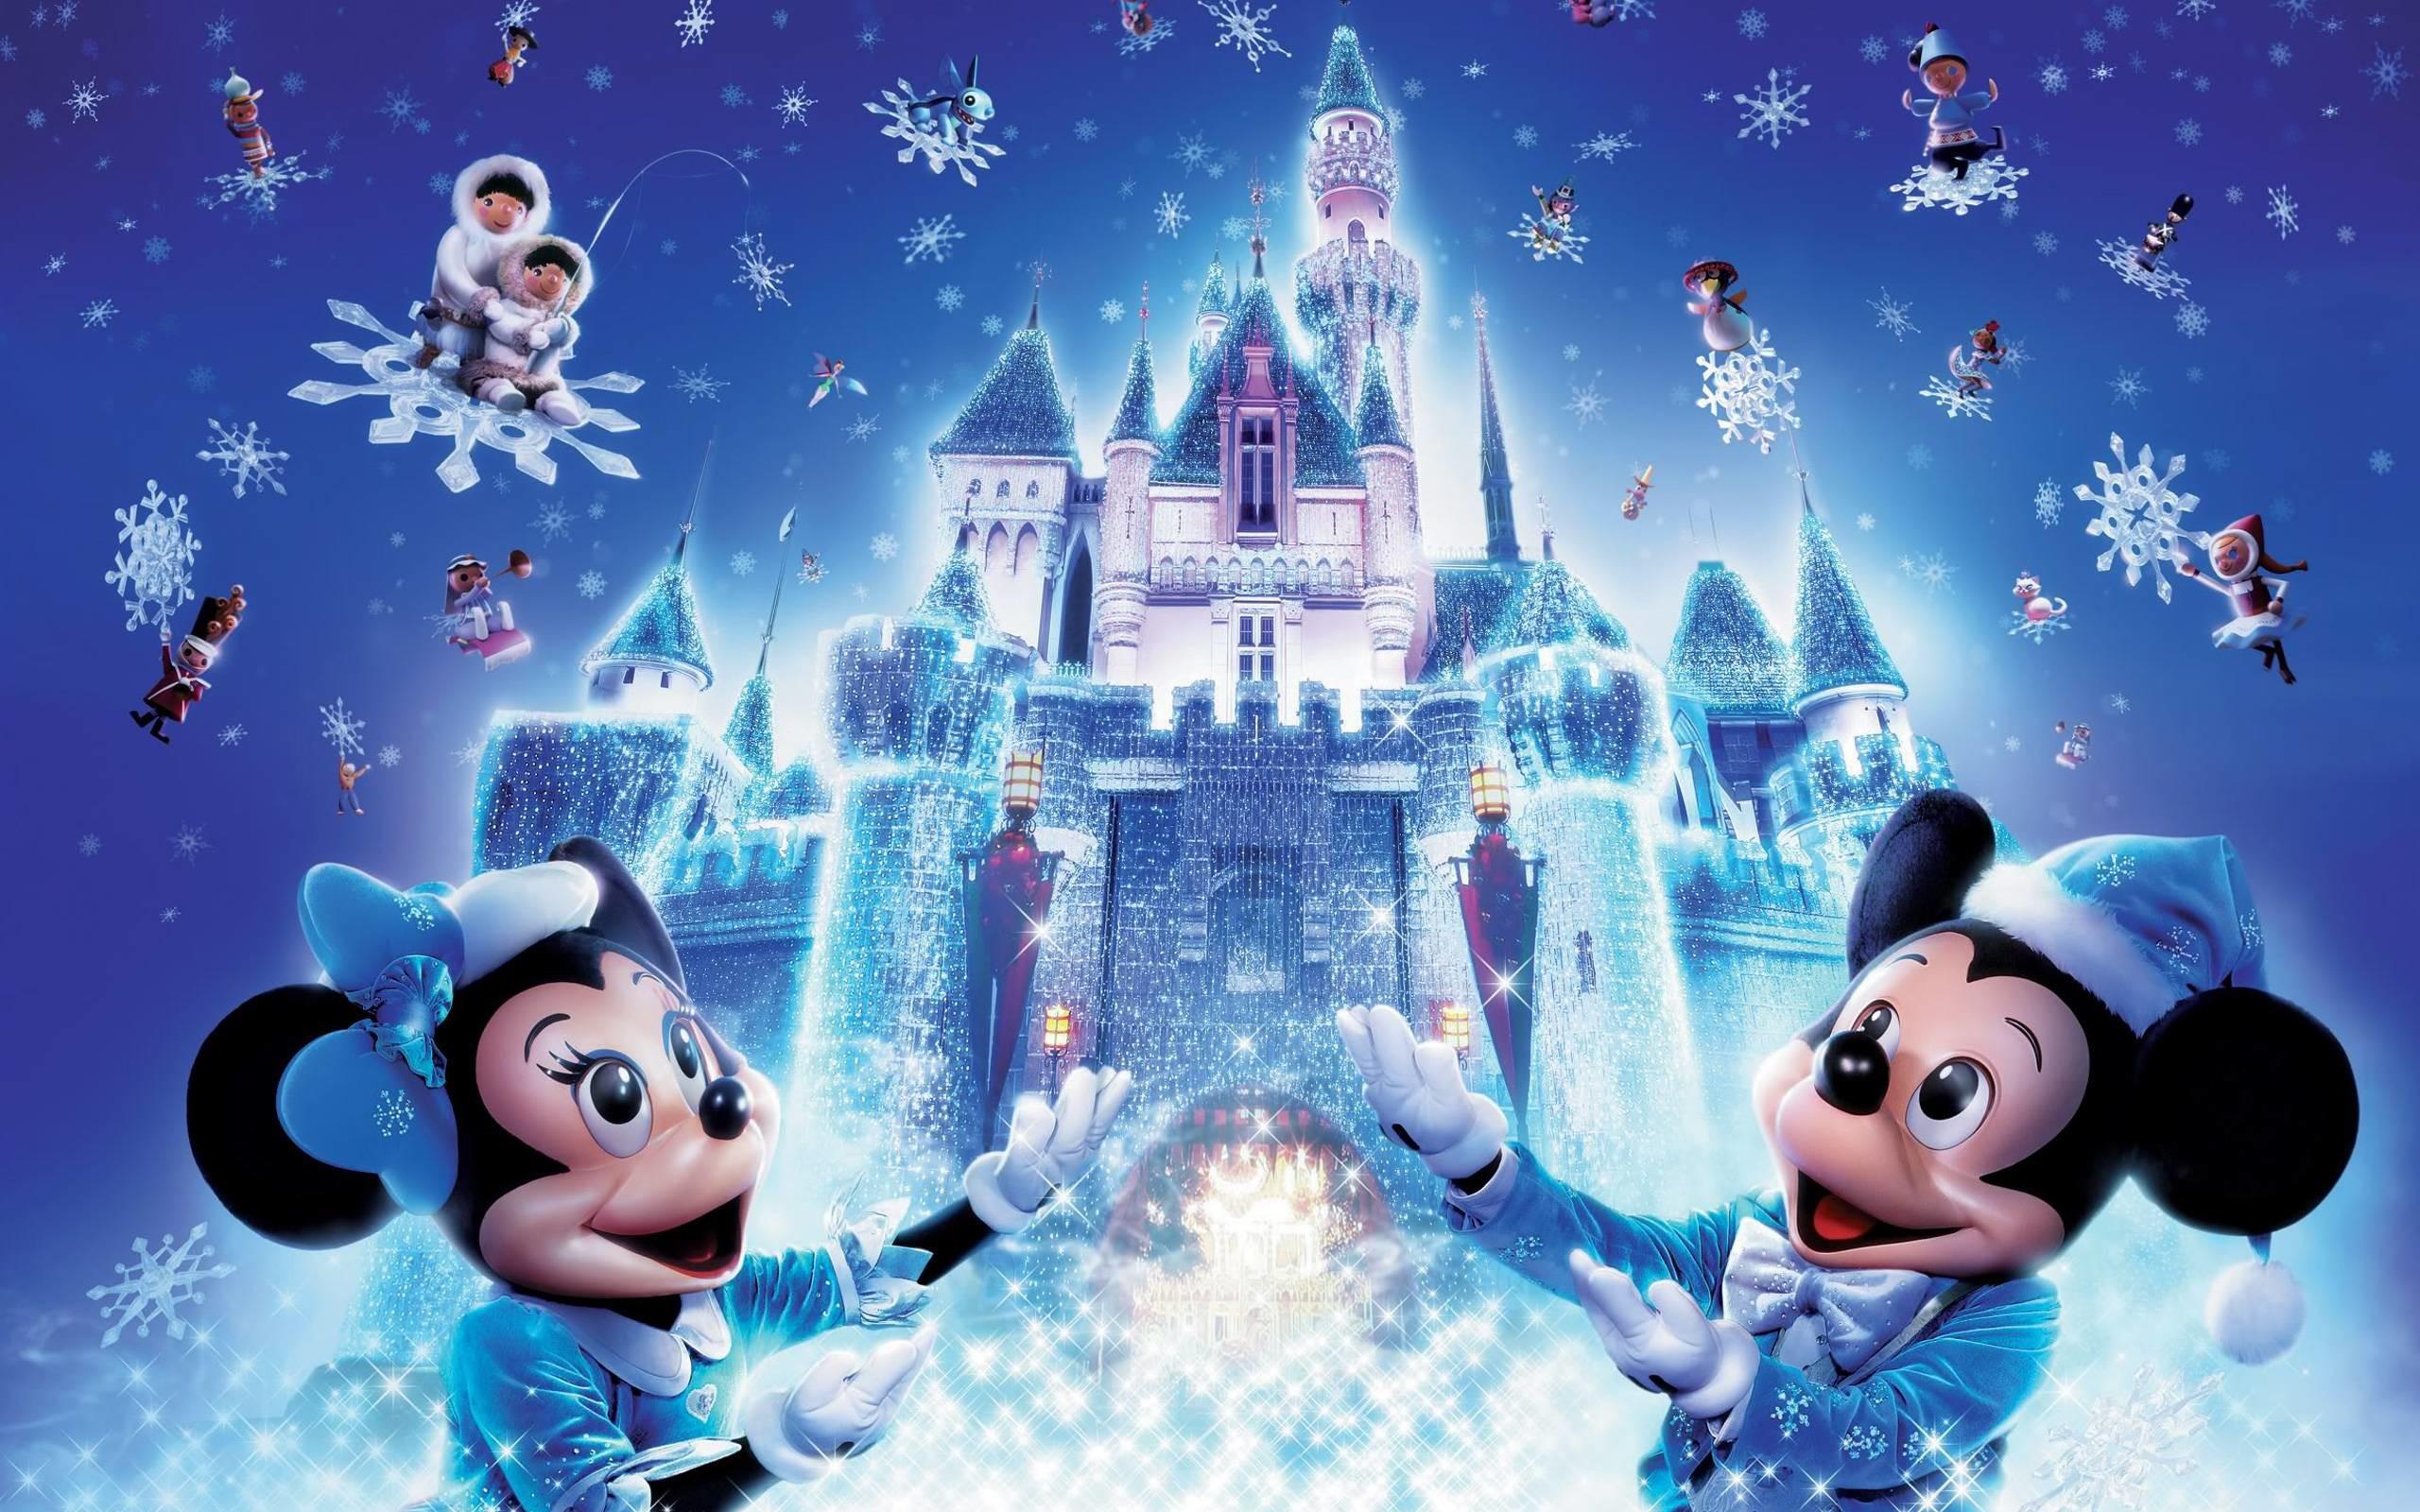 Christmas desktop · Free Disney Desktop Wallpaper Backgrounds Wallpaper Cave